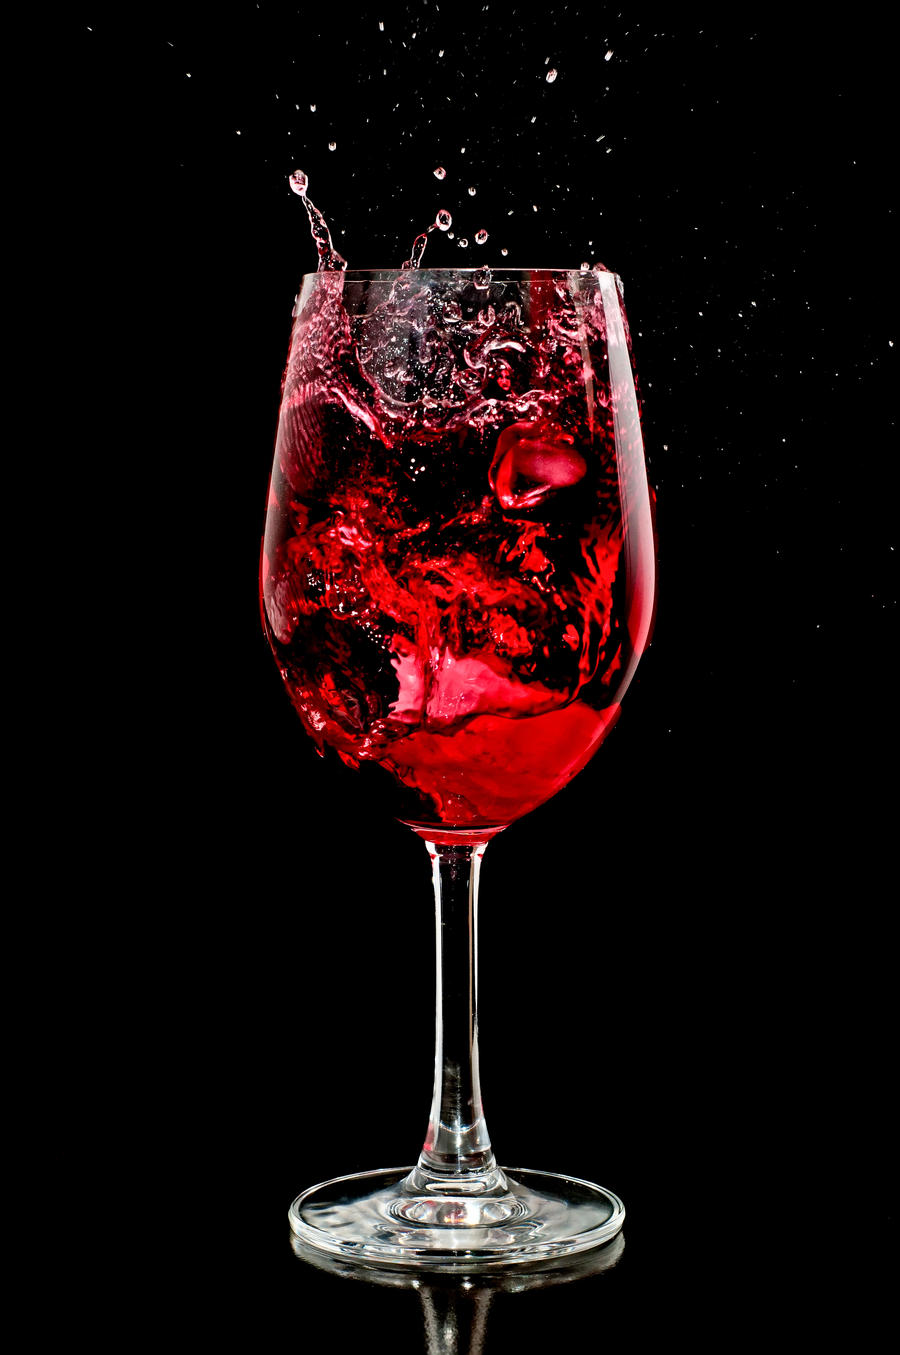 Chaos - Wine Glass Splash by ShogunMaki on DeviantArt